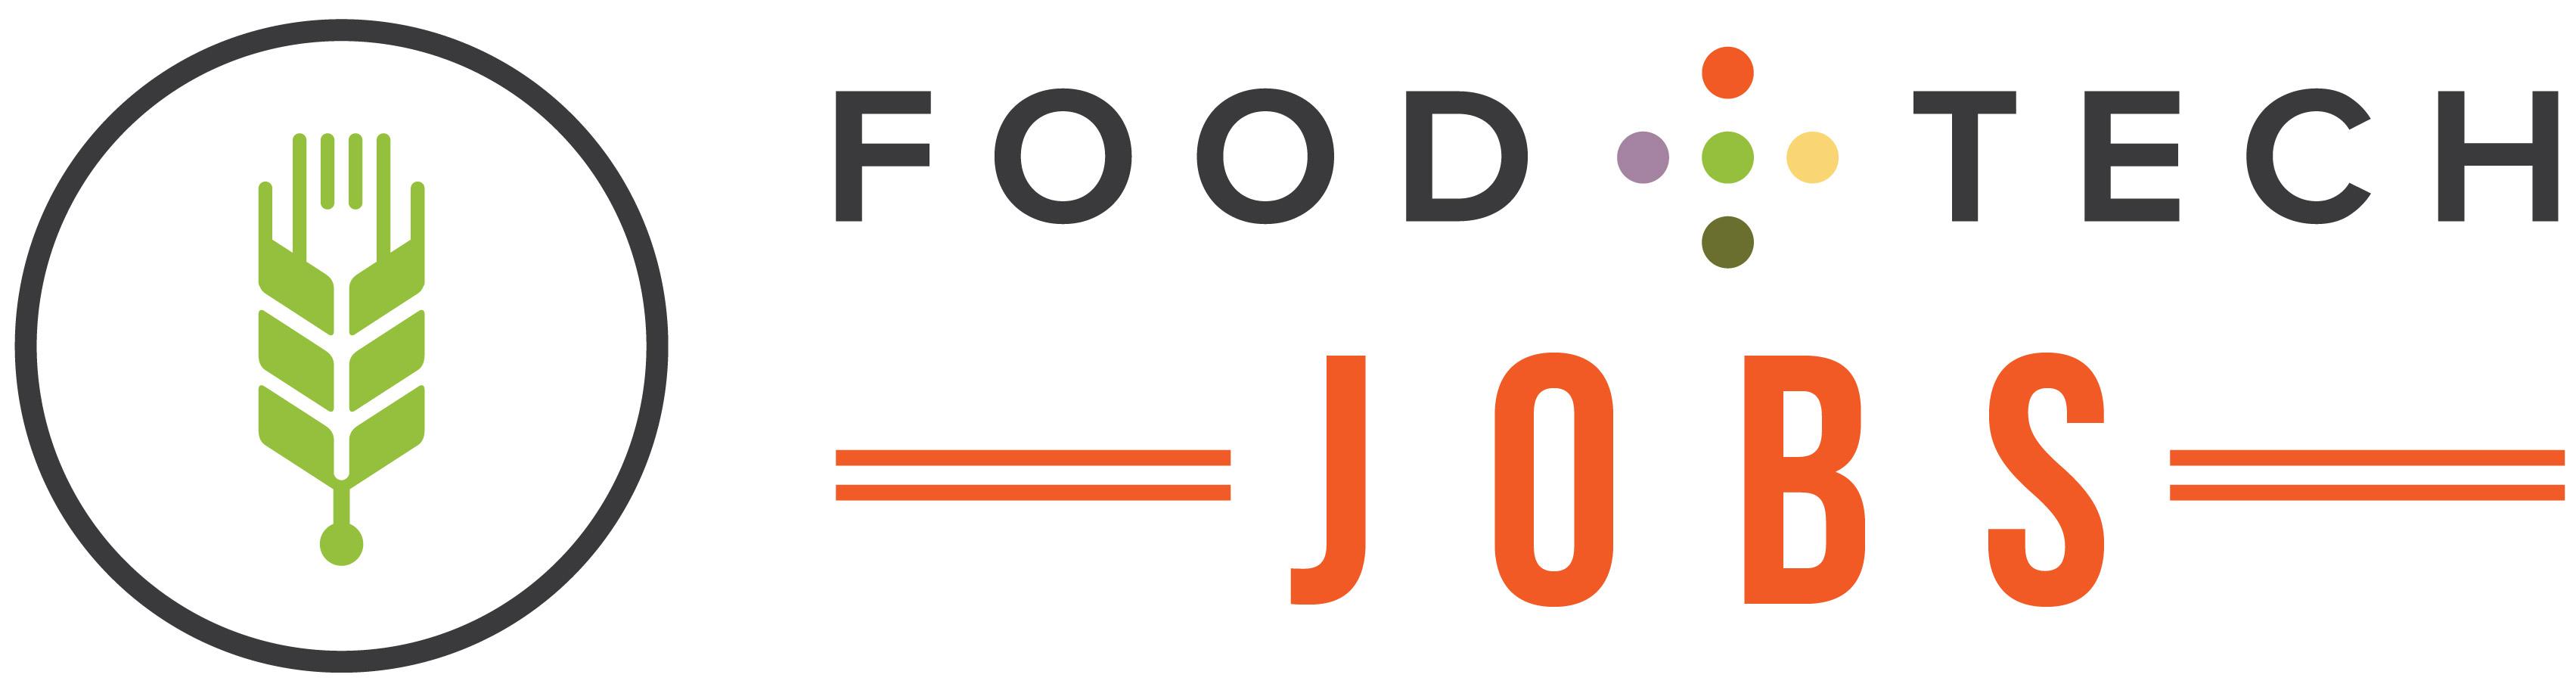 Home - Food+Tech Jobs